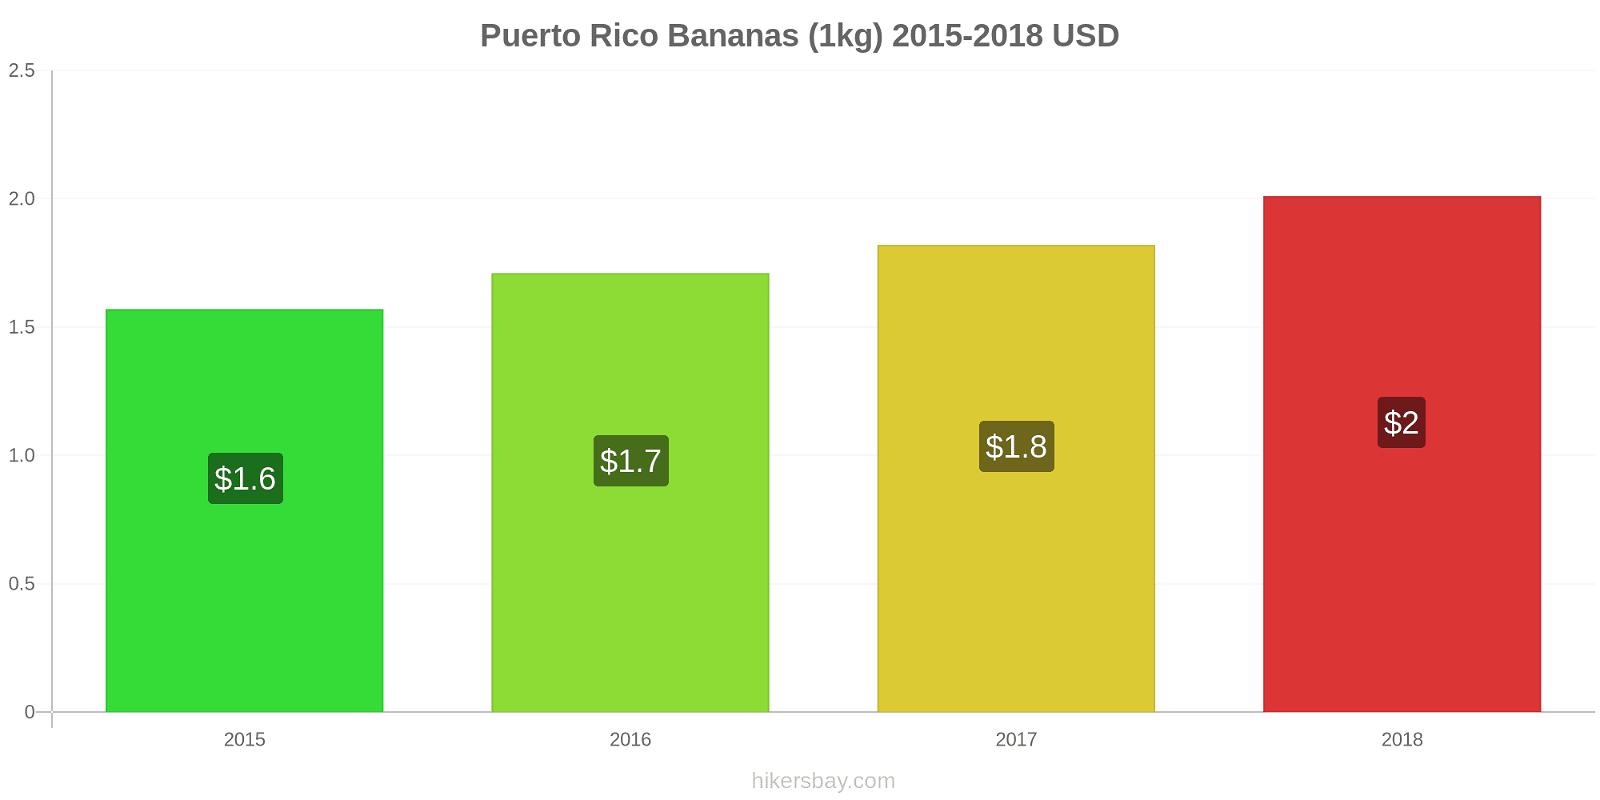 Puerto Rico price changes Bananas (1kg) hikersbay.com